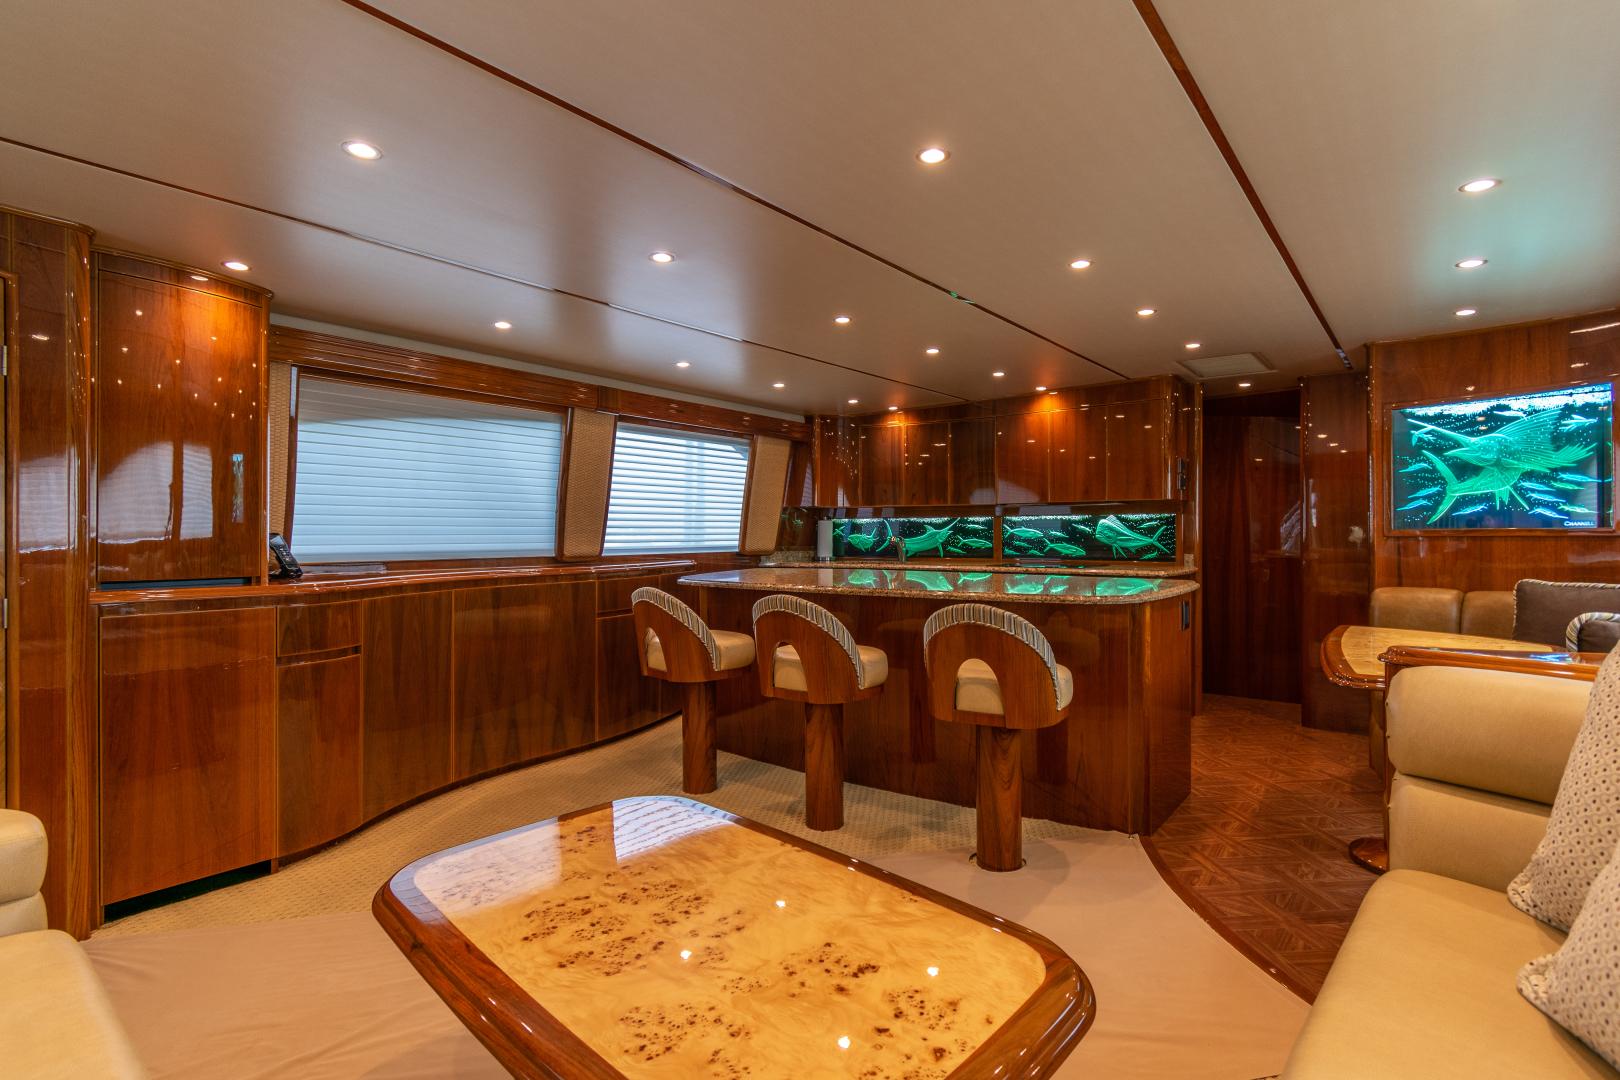 Viking-70 Convertible 2014-Load N Go Port Aransas-Texas-United States-2014 70 Viking Load N Go Salon (5)-1380506 | Thumbnail